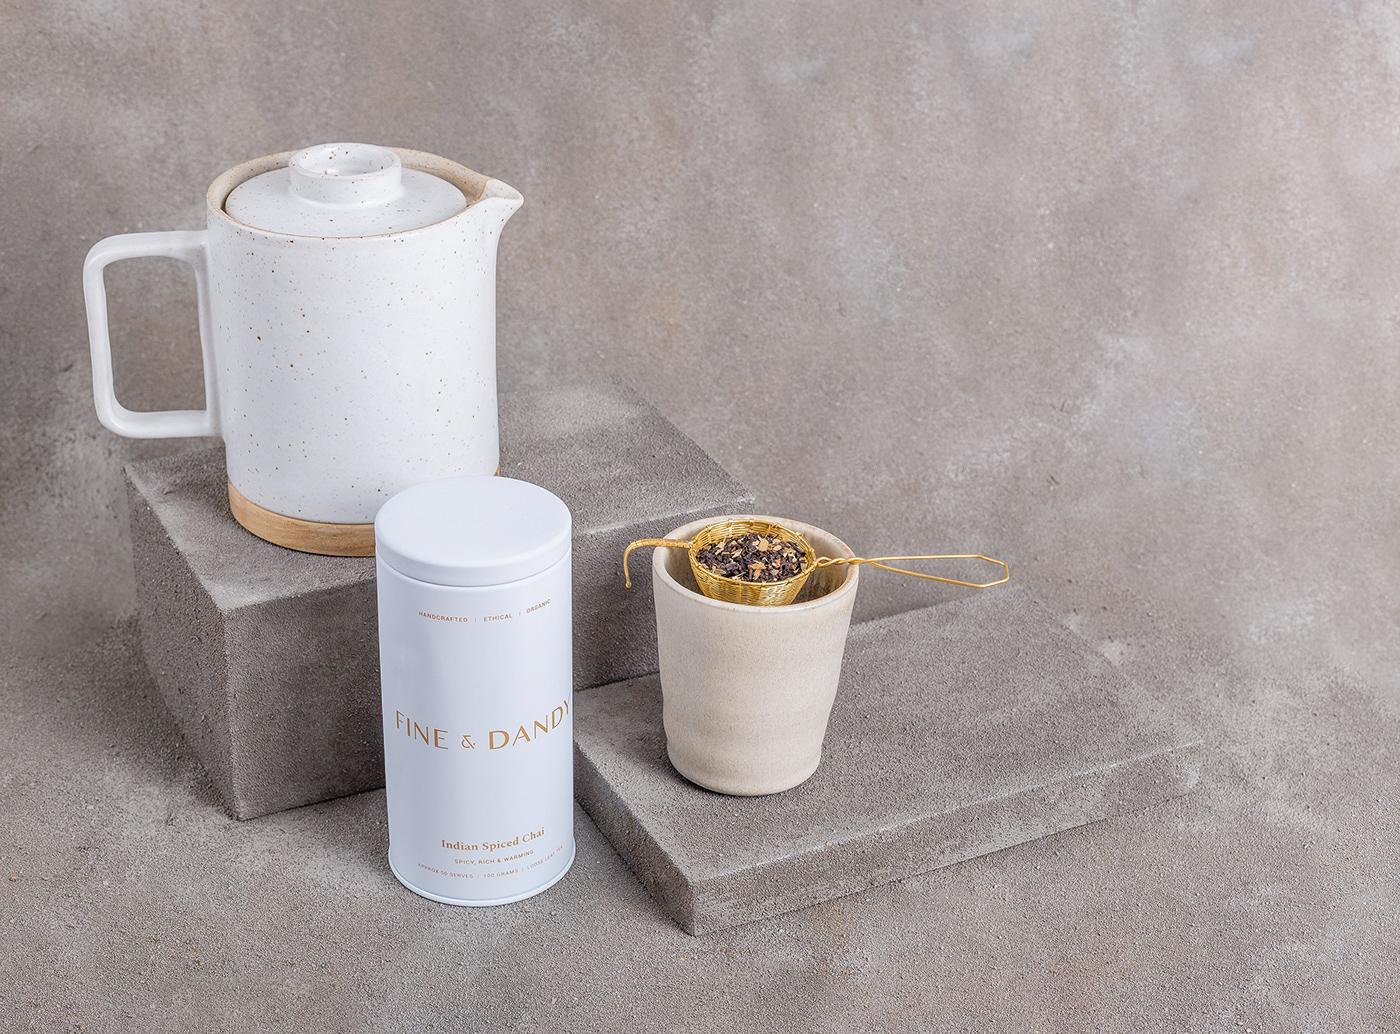 Image may contain: cup, coffee and mug